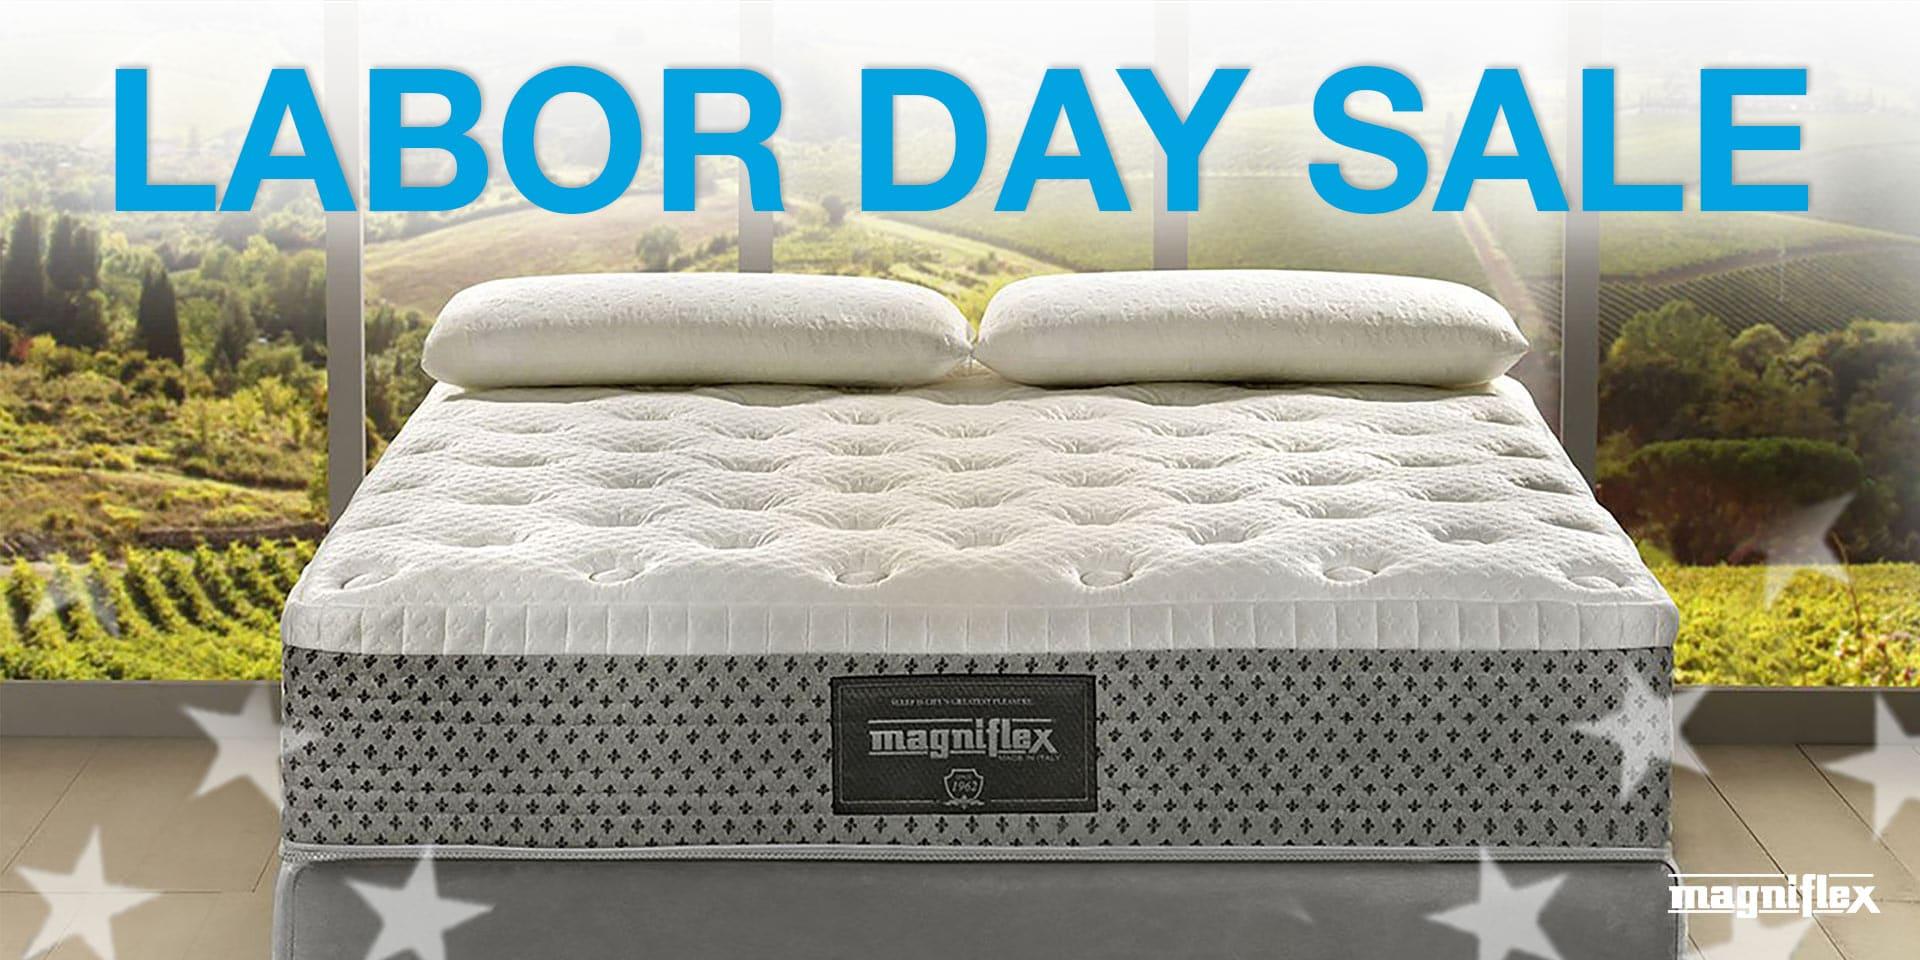 Magniflex Labor Day Sale